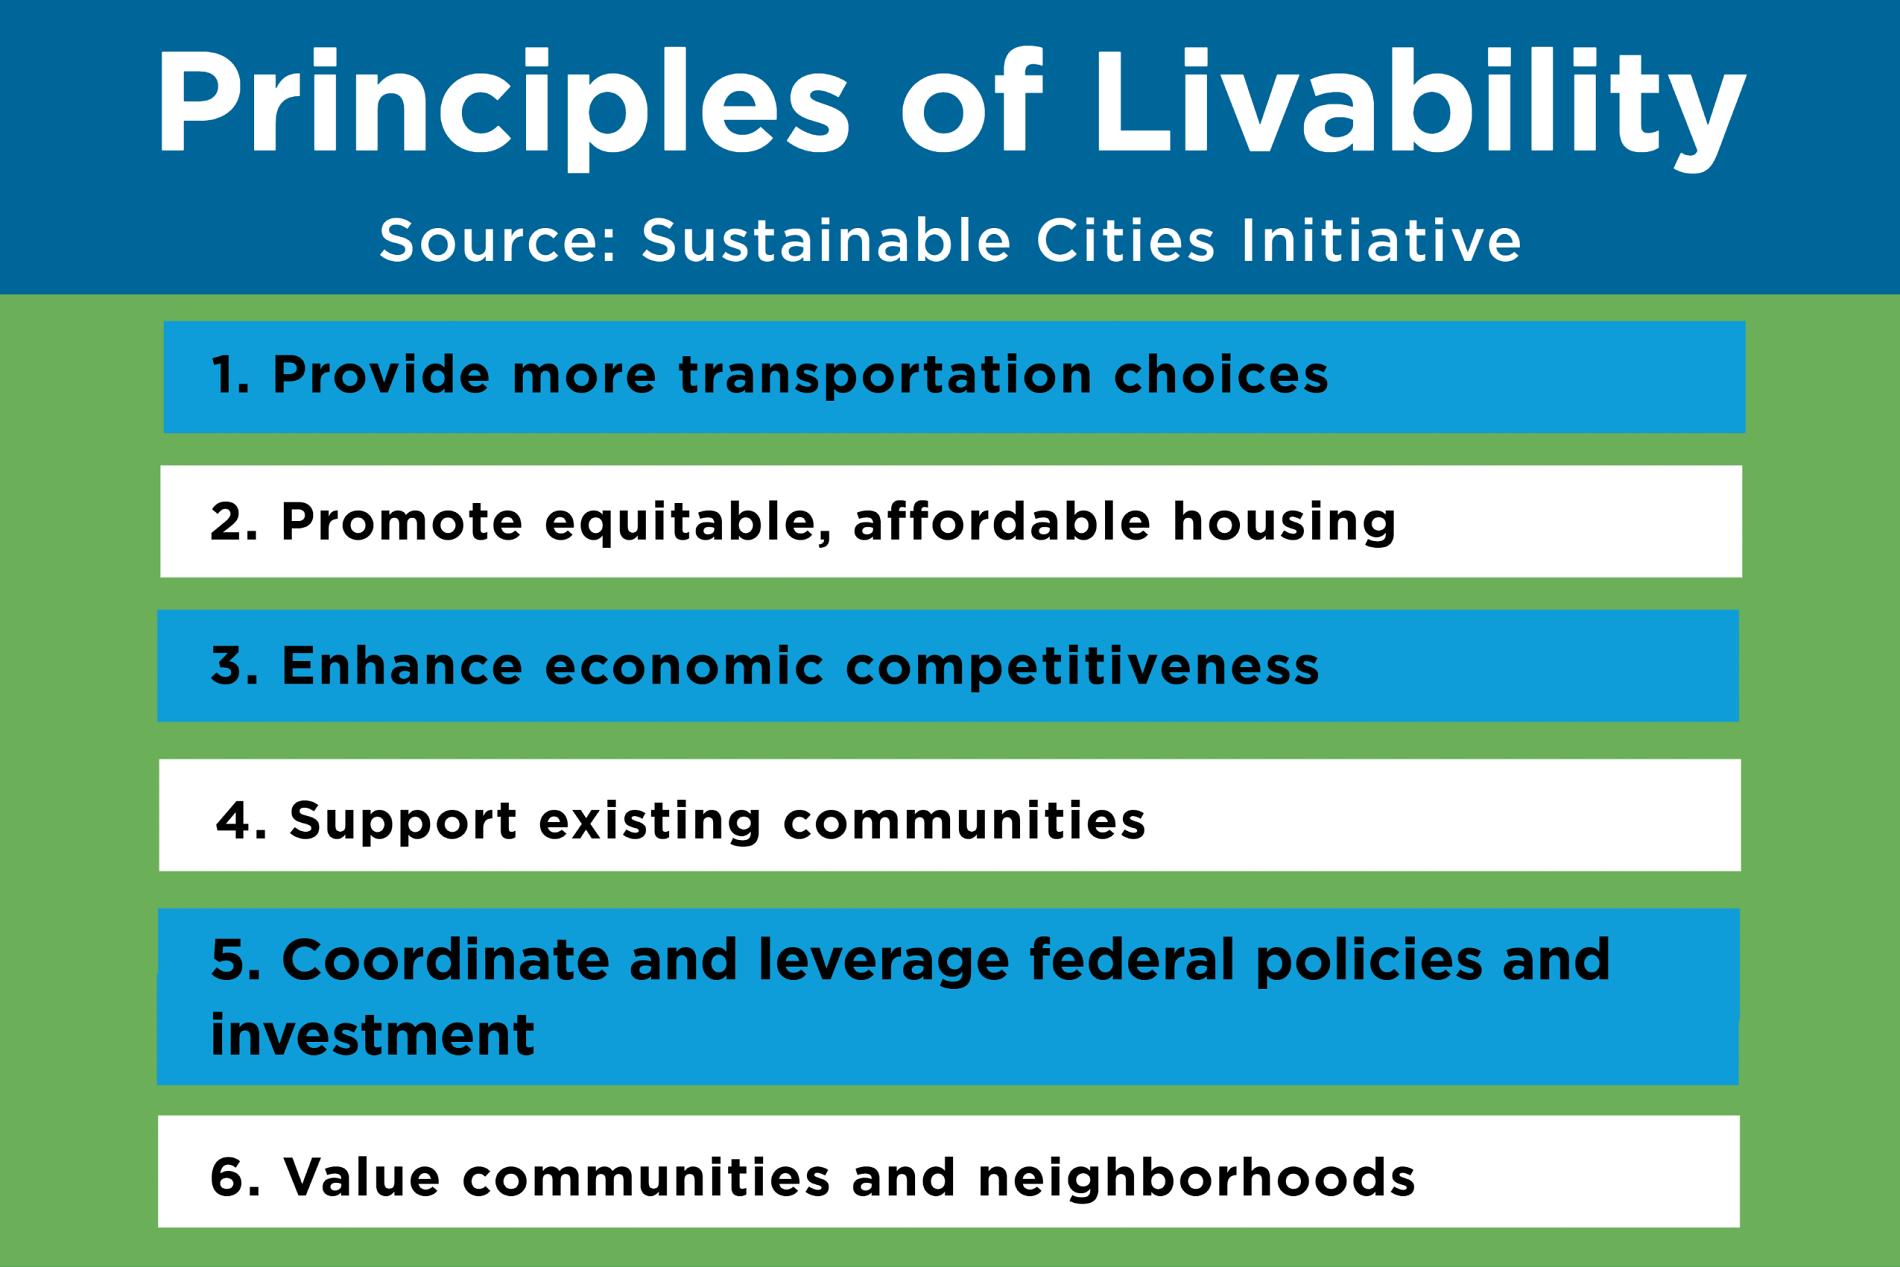 Principles of Livability